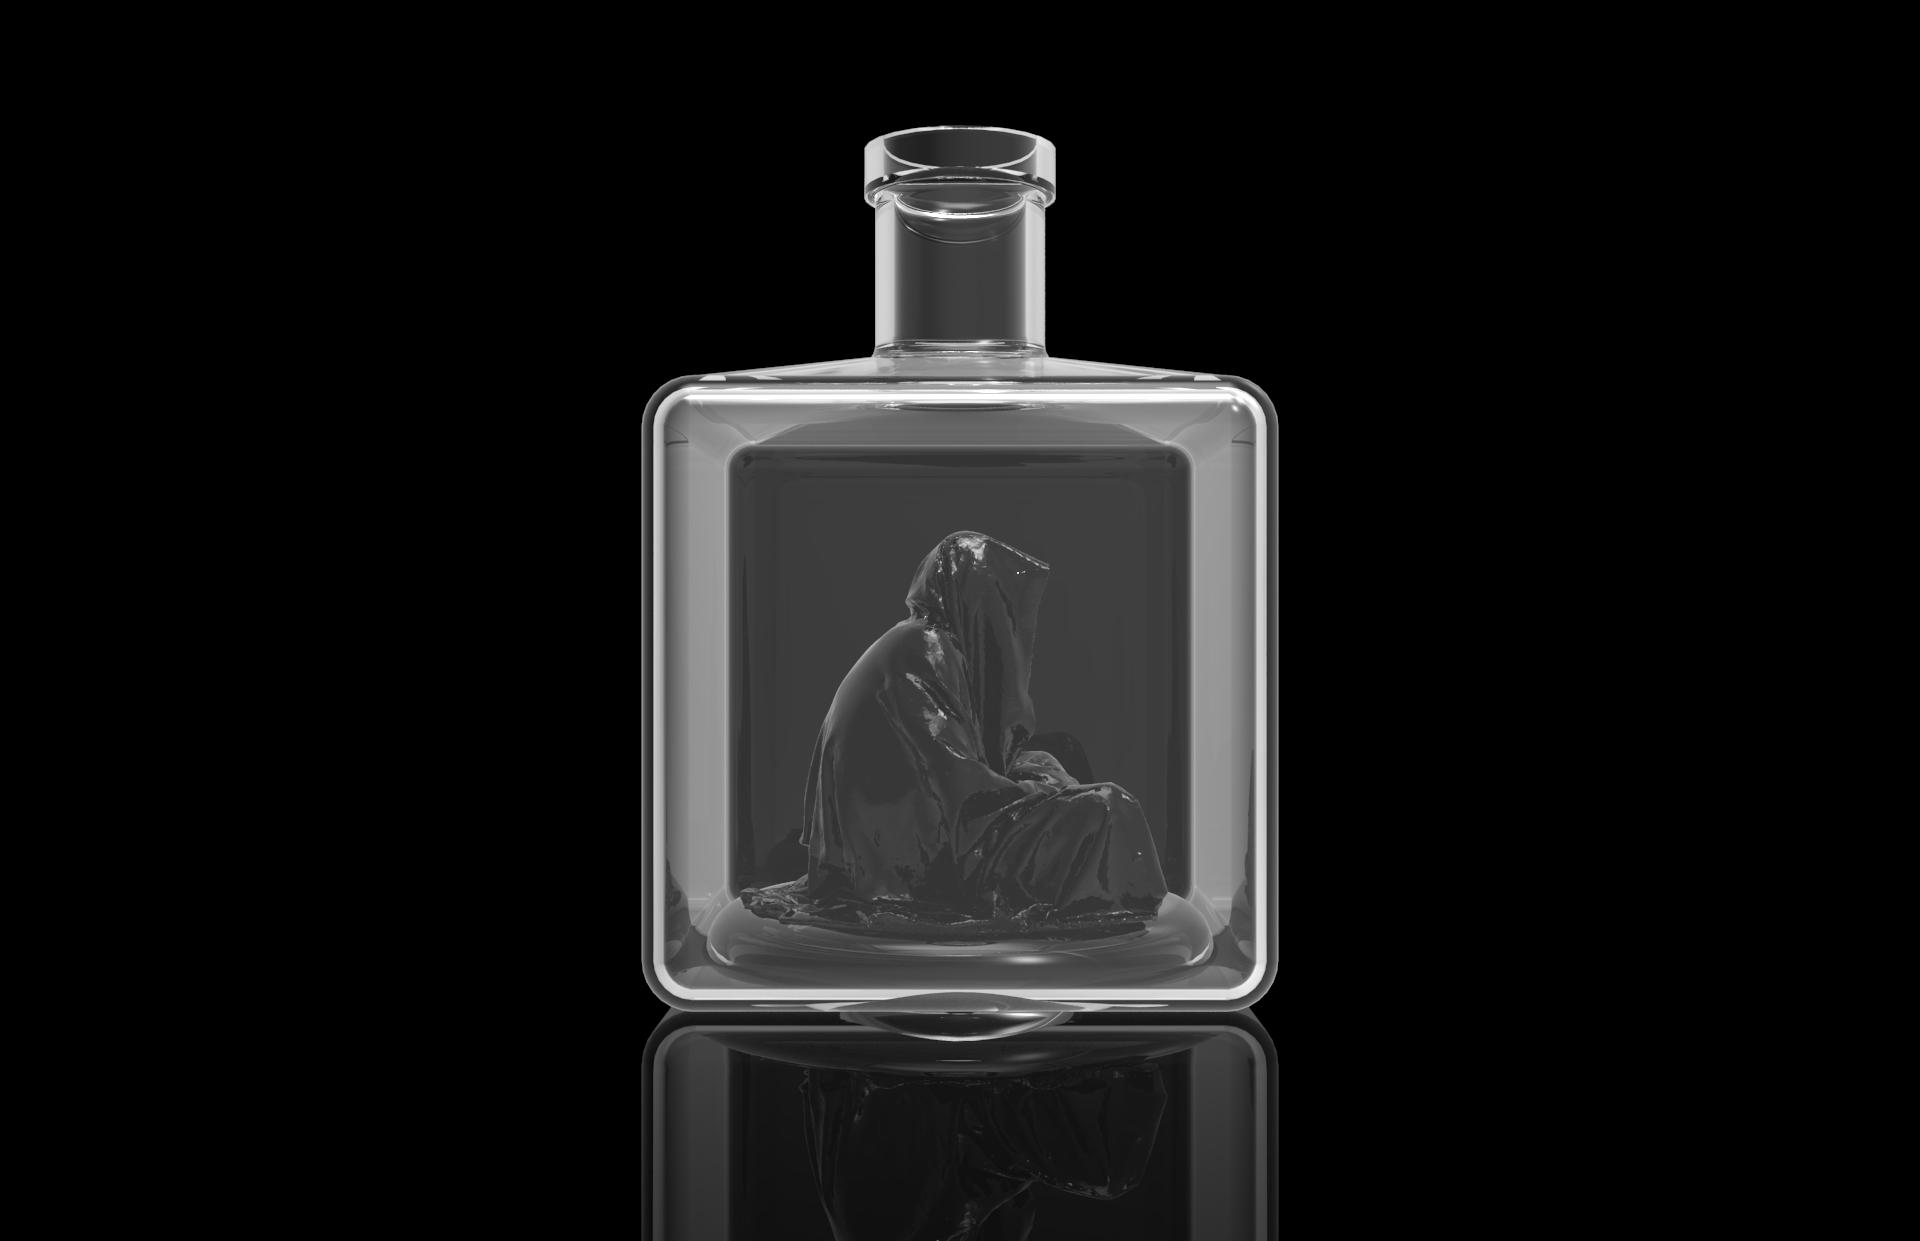 Guardian glass bottle wadka water drink manfred kili kielnhofer art arts design glass  449